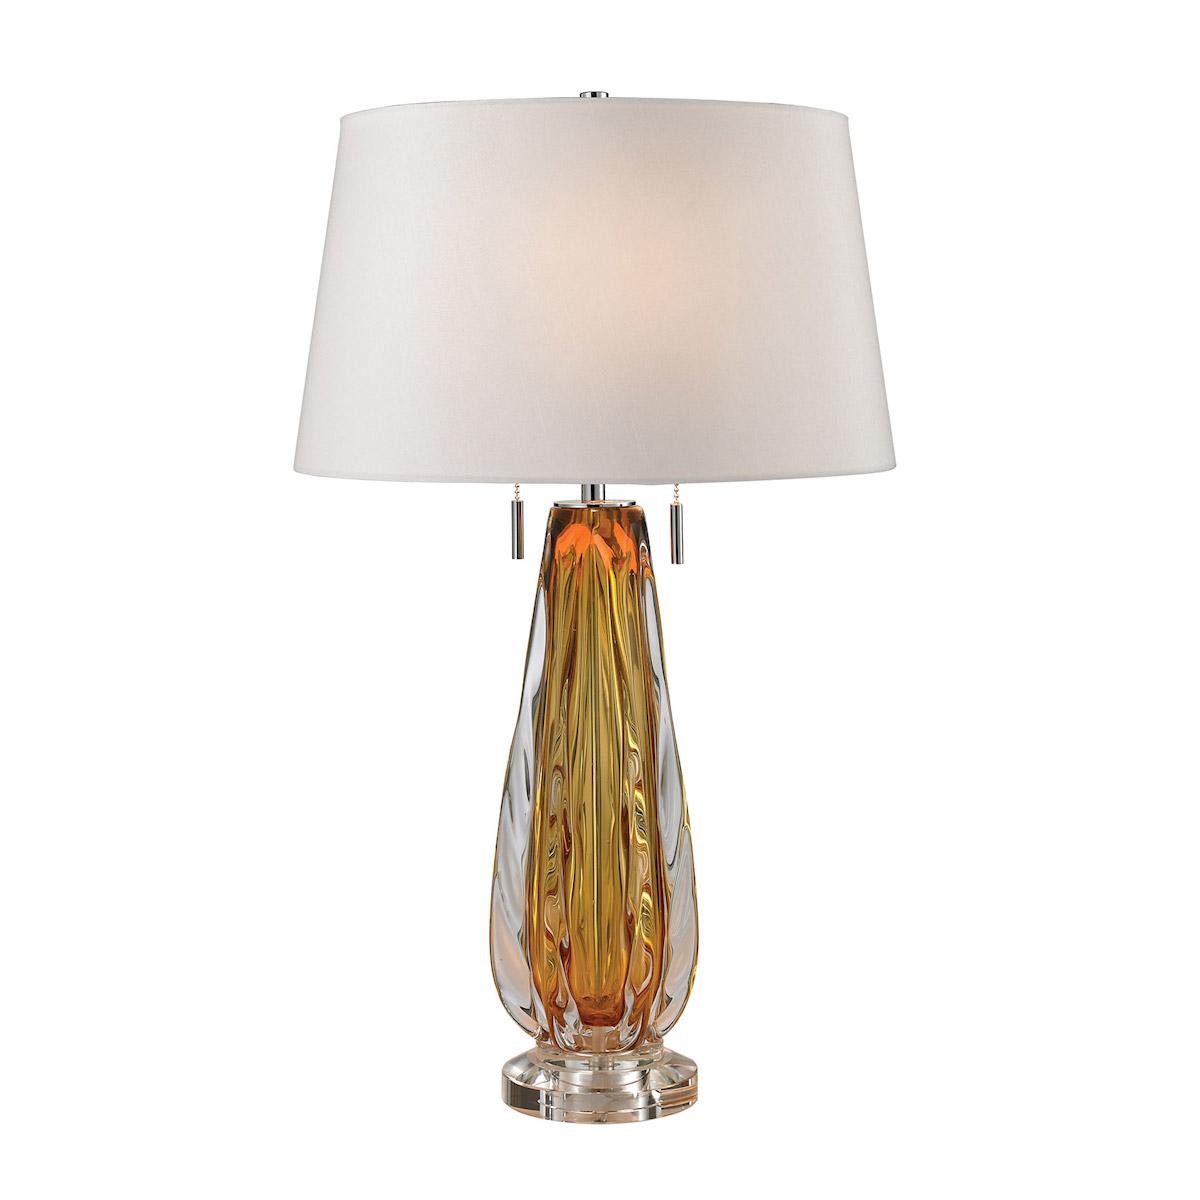 Elk Lighting D2669-LED Modena Free Blown Glass LED Table Lamp in Amber